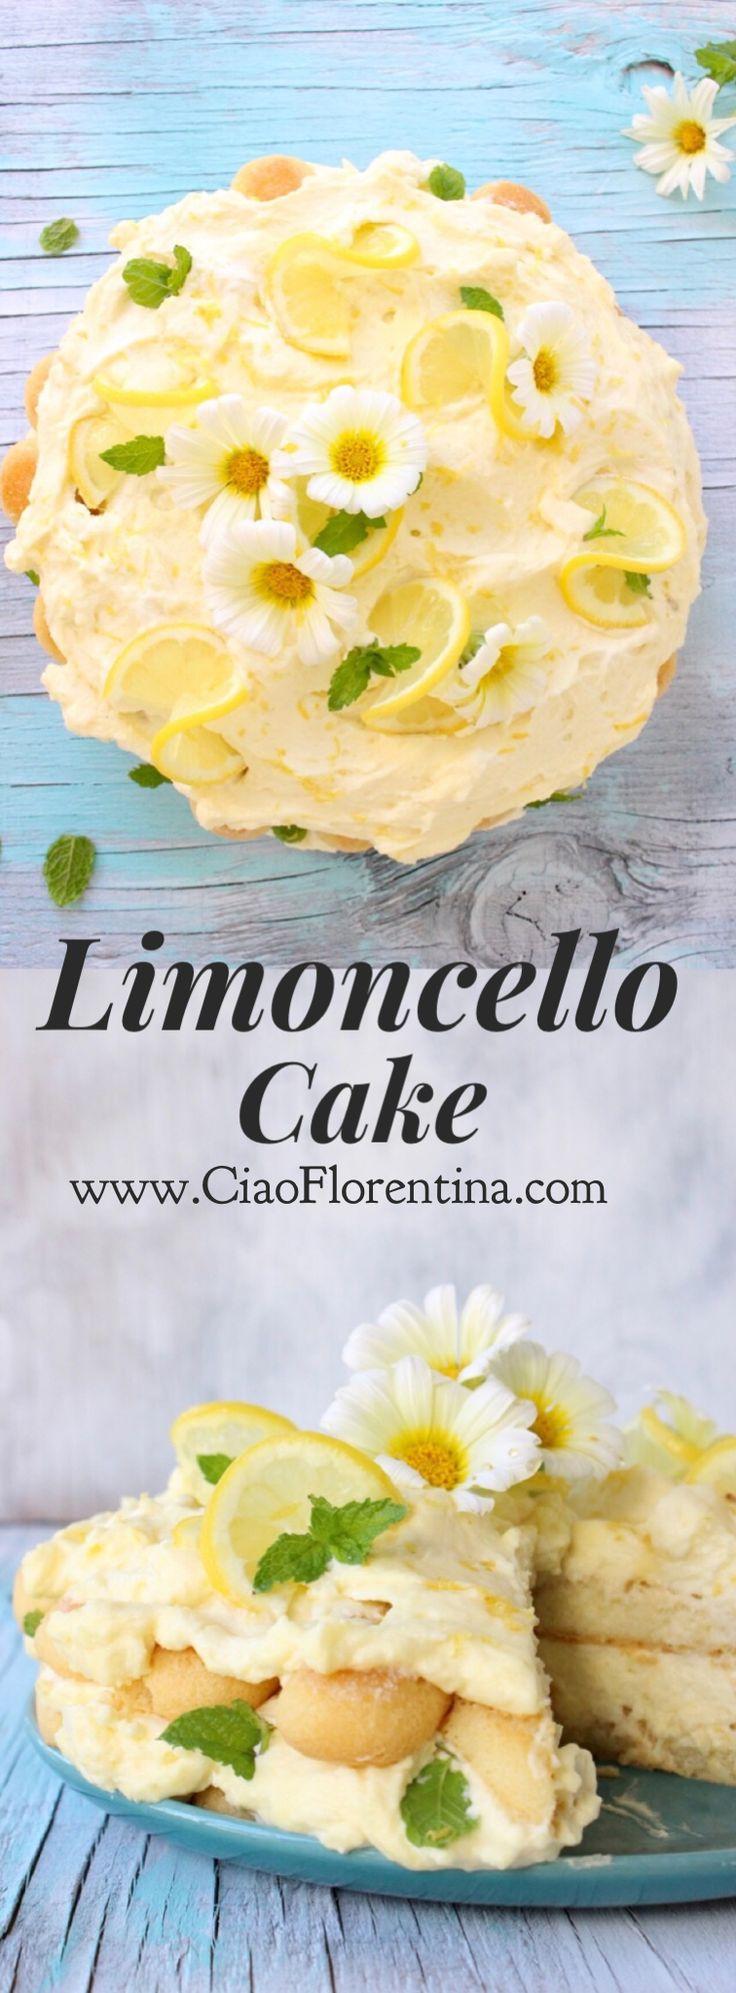 Limoncello Cake   CiaoFlorentina.com @CiaoFlorentina